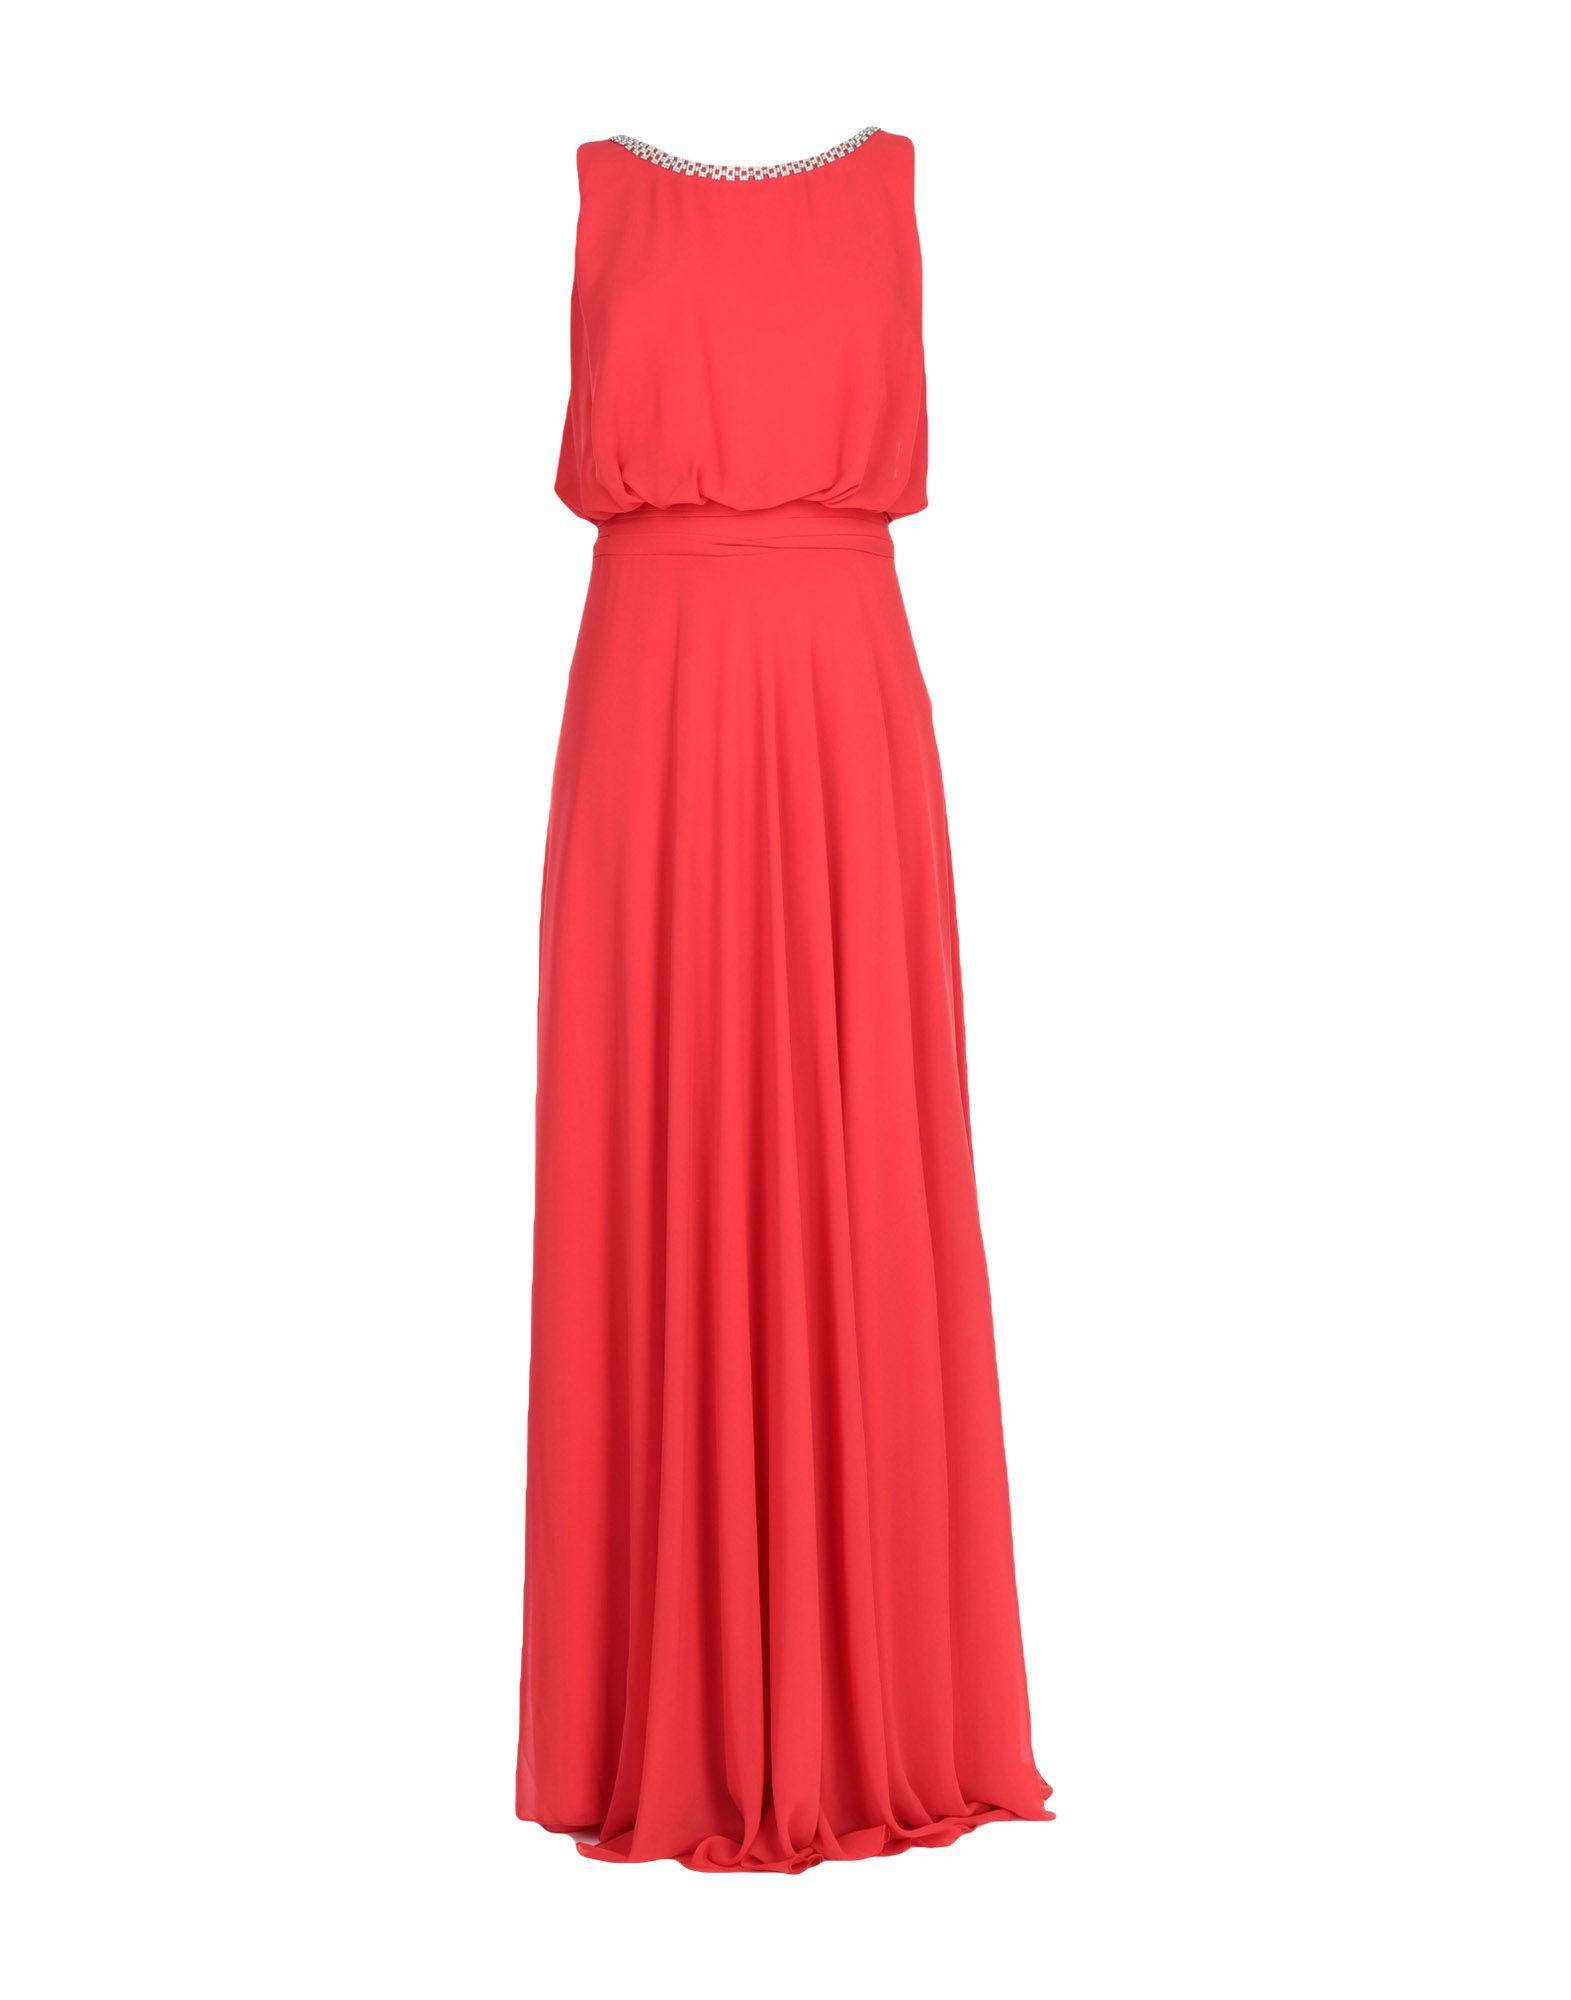 NOZZE COLLECTION Длинное платье платье demurya collection demurya collection mp002xw1anvz